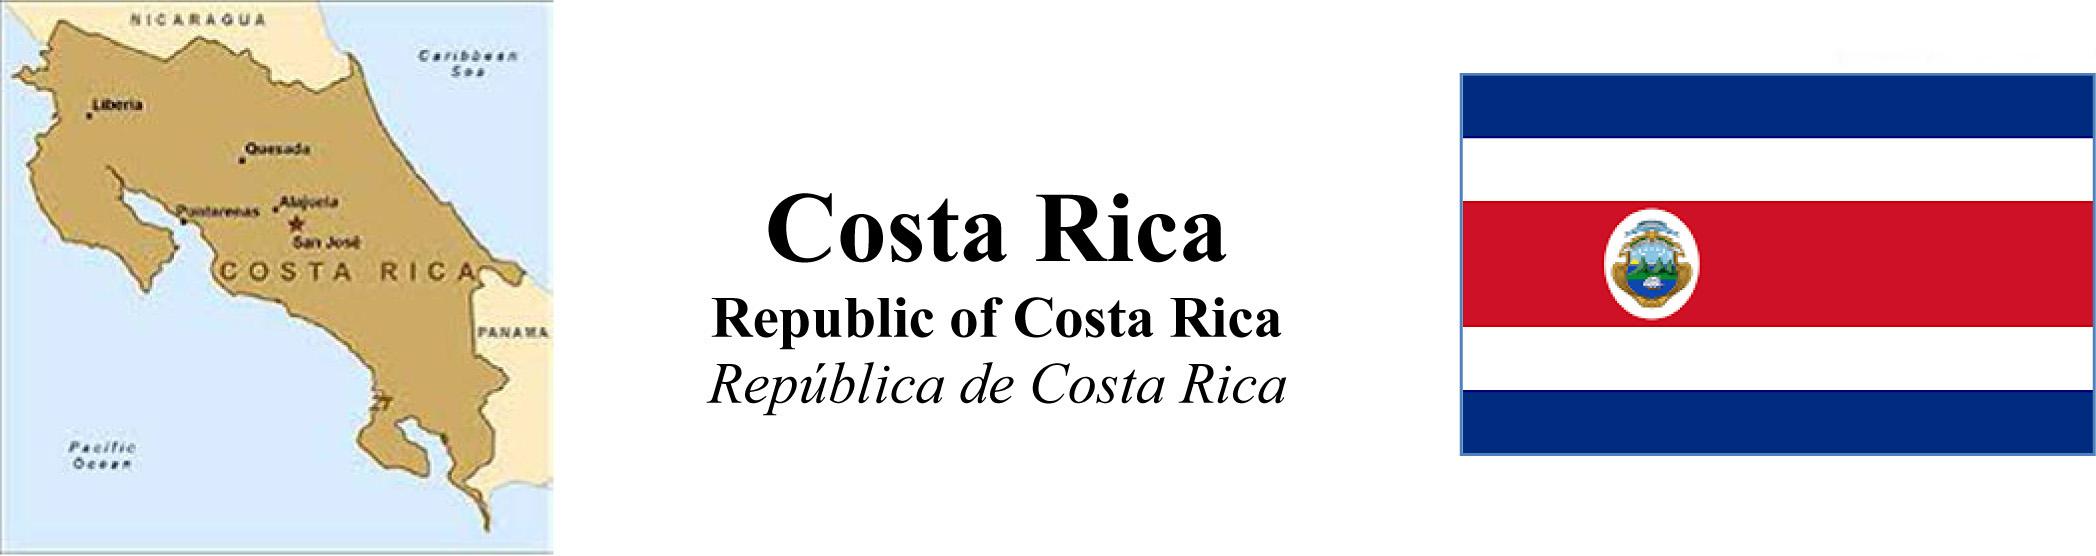 Costa Rica Map & Flag